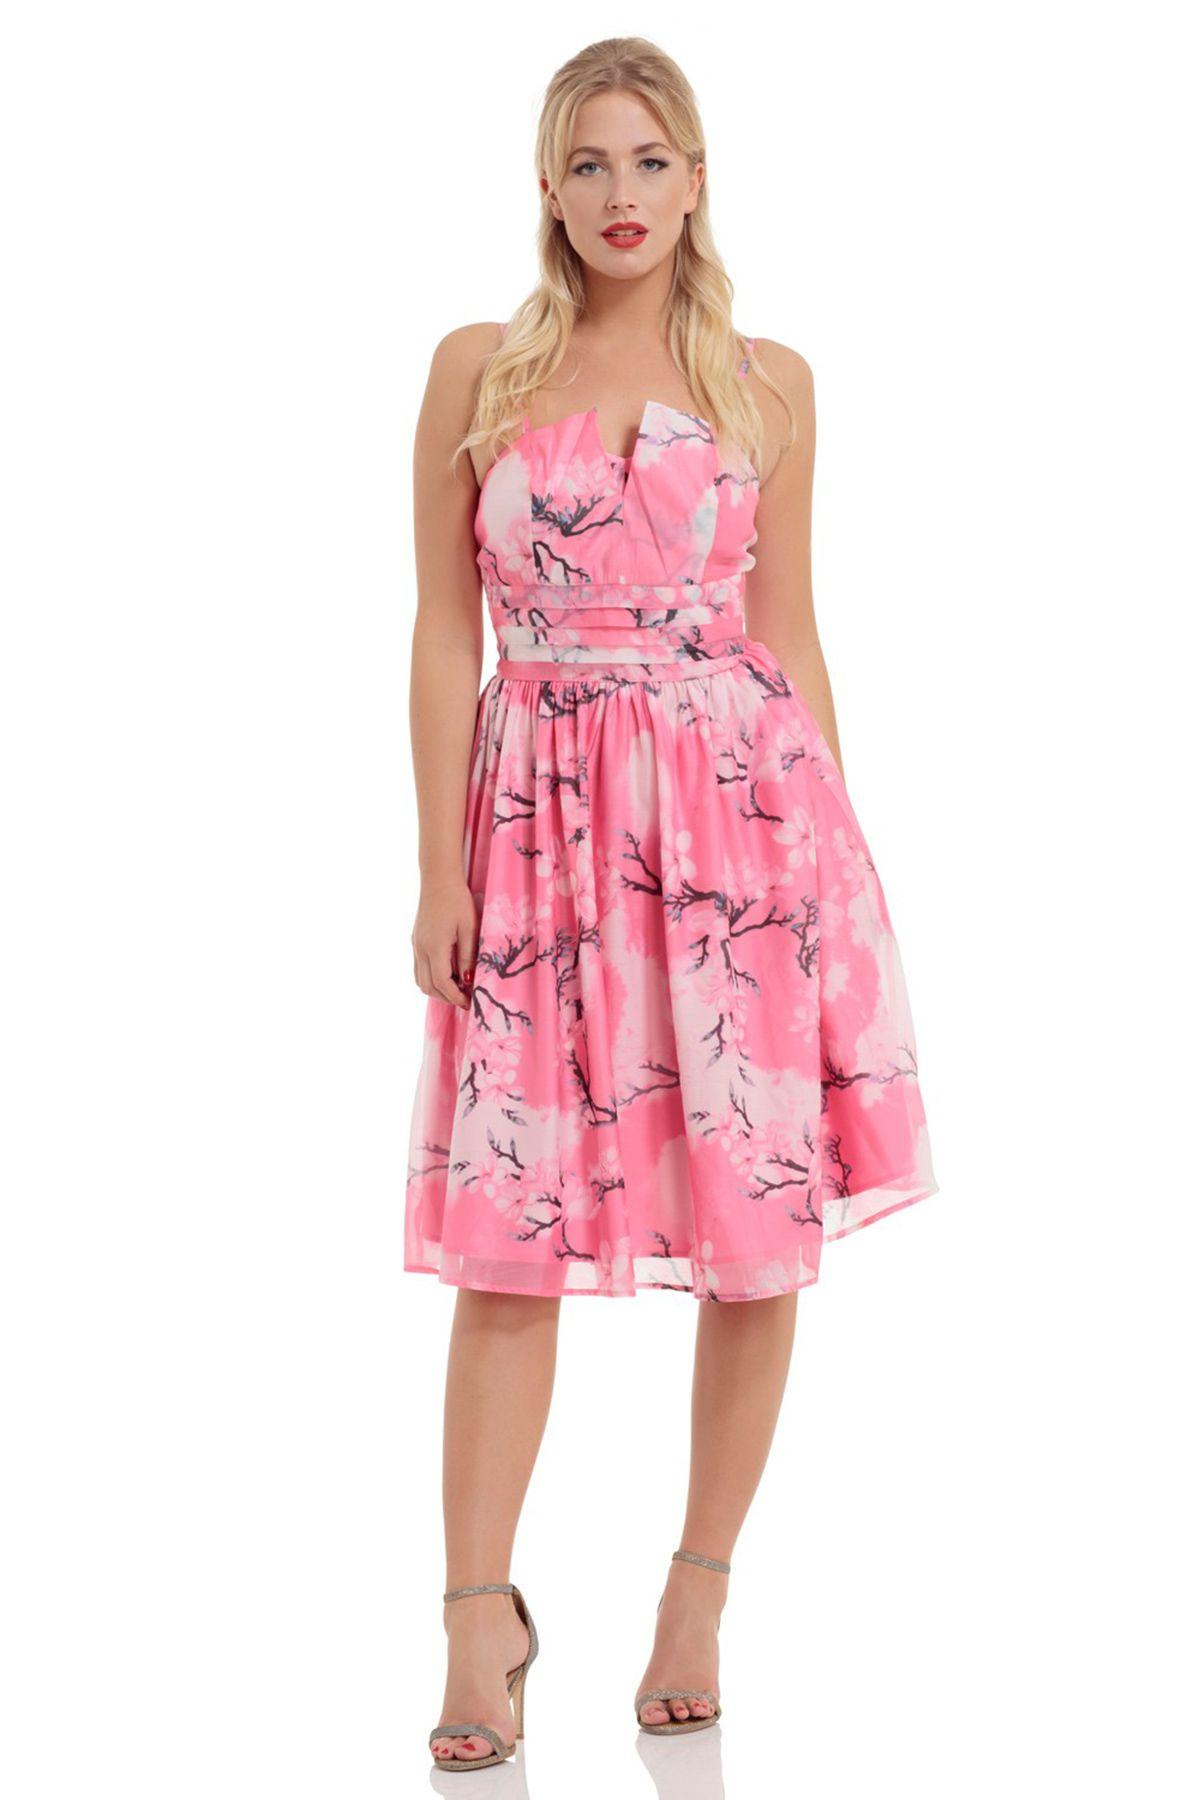 7528e1c63a30 Ροζ Φλοράλ Φόρεμα - London Βoutique